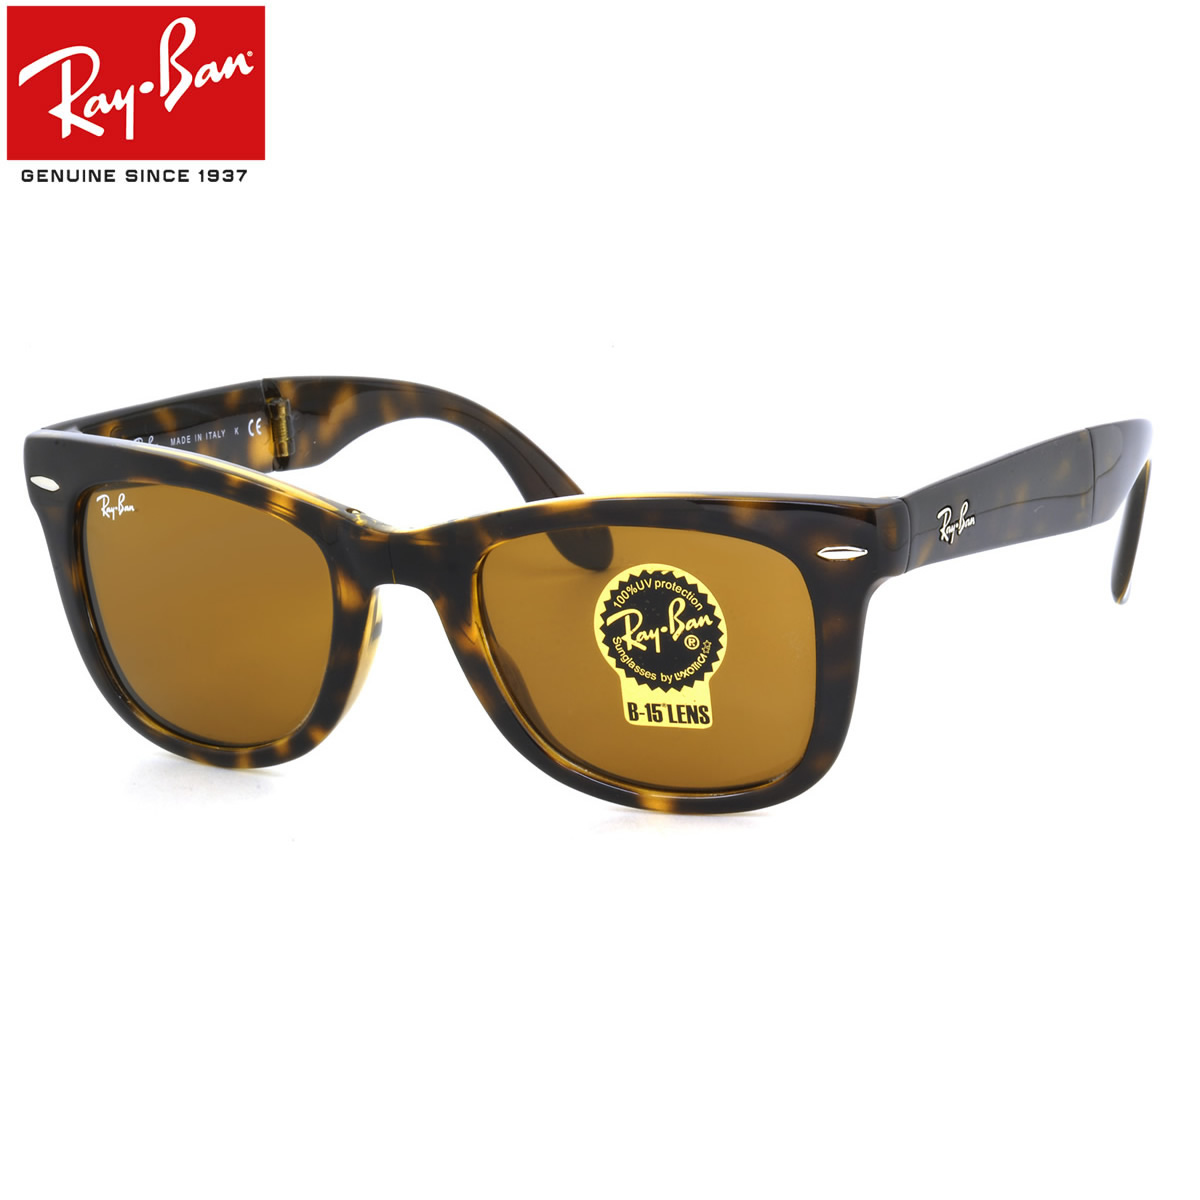 Men Tortoiseshell Ban Tortoise Folding Rb4105 710 Icon Icons Farrar 50 Wayfarer Ray Rayban Way Sunglasses Size Shell 35Aj4RL